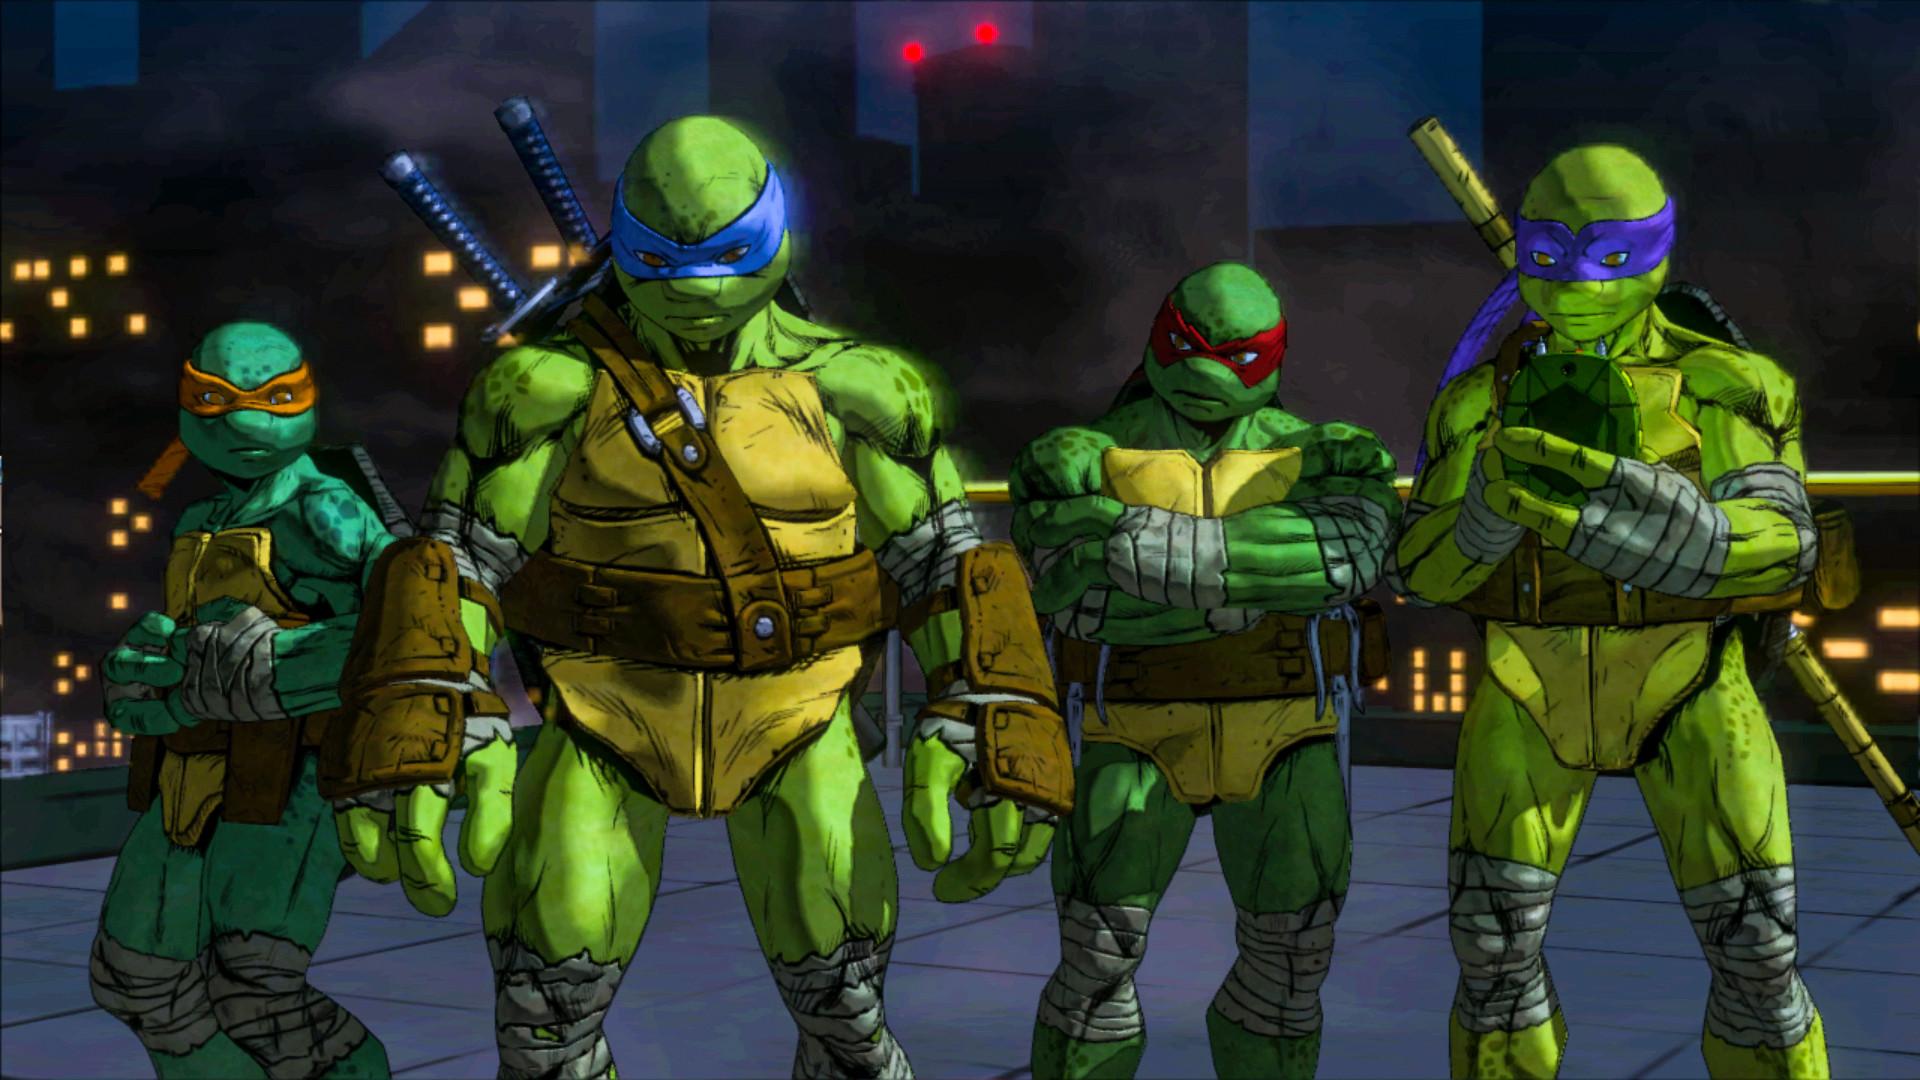 Teenage Mutant Ninja Turtles Mutants In Manhattan ESPAÑOL PC Full (CODEX) + REPACK 2 DVD5 (JPW) 1